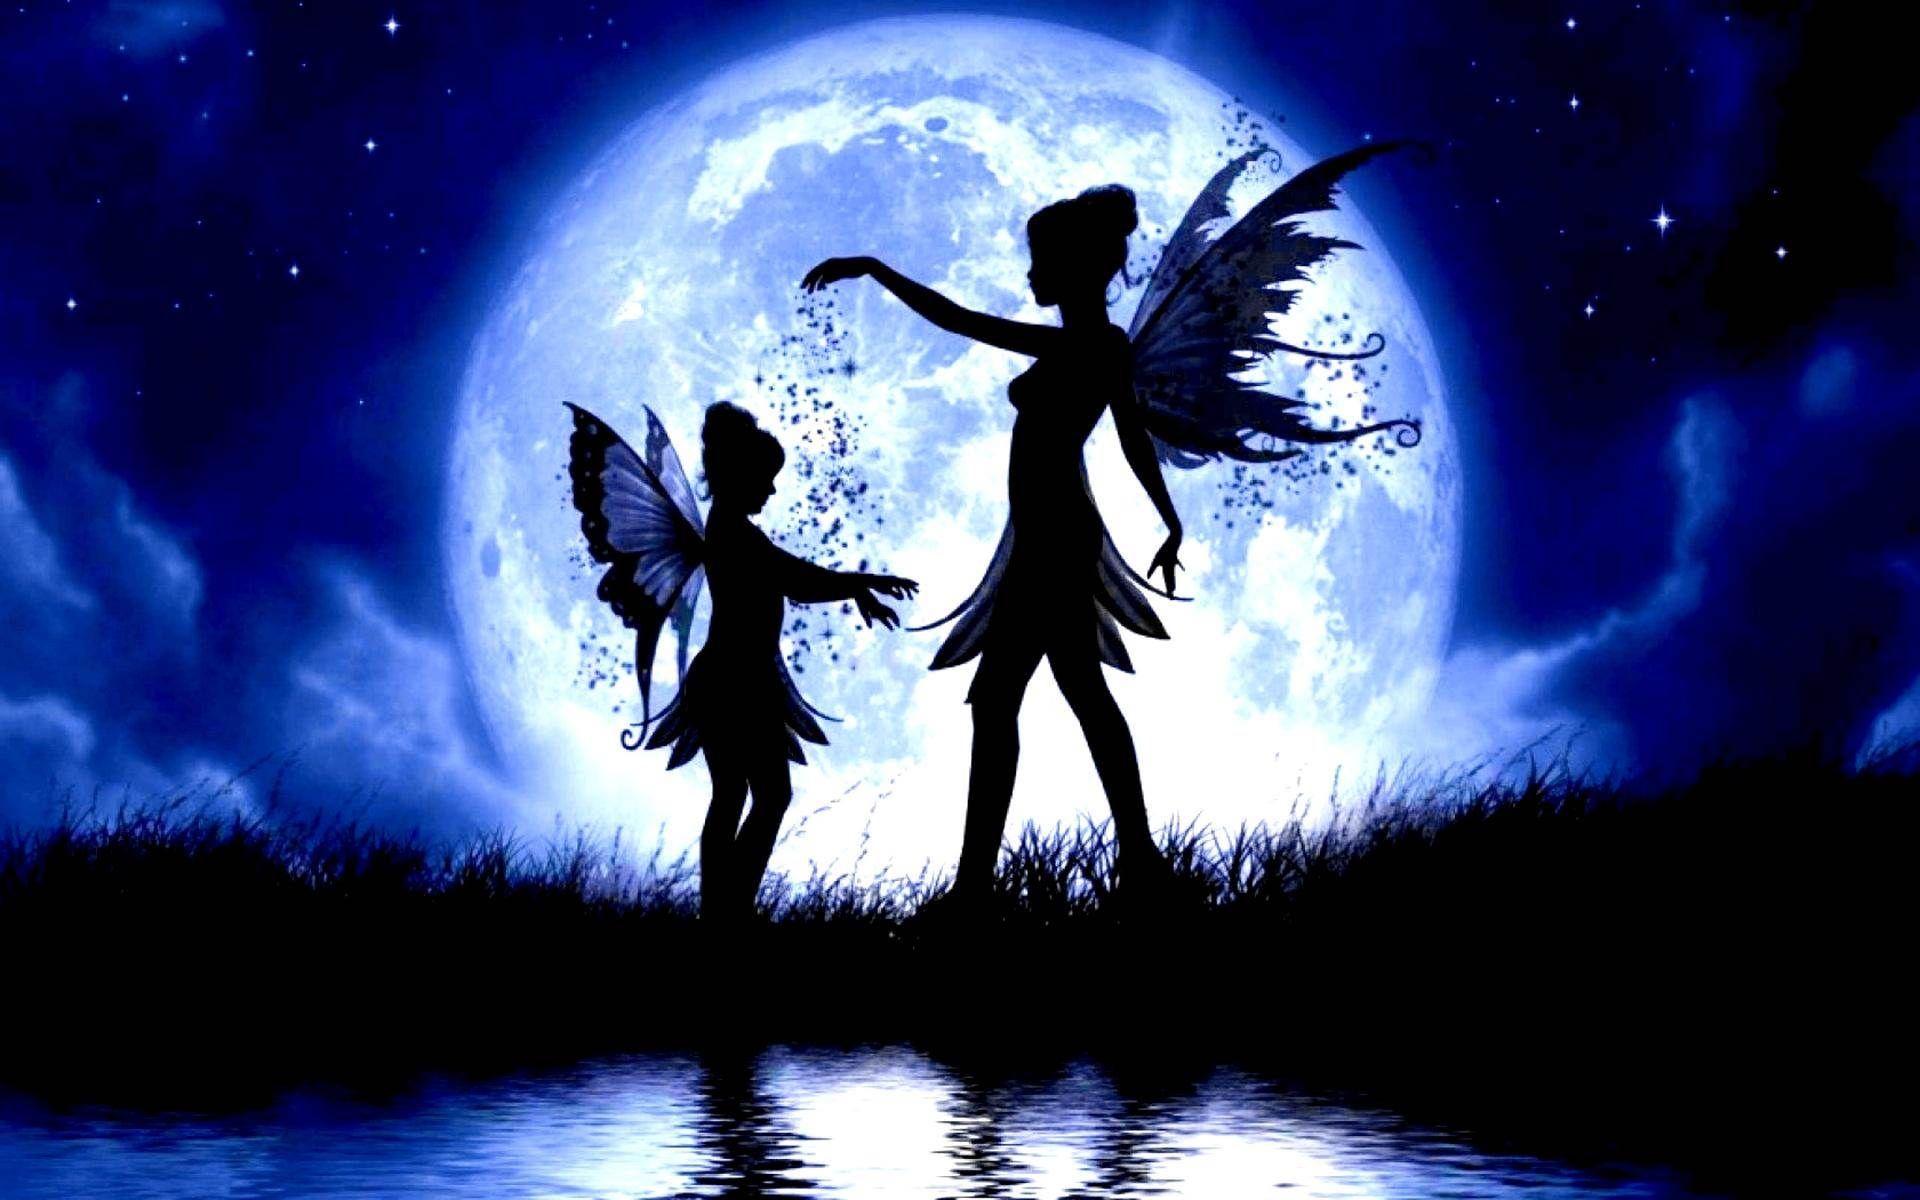 Beautiful Wallpaper Night Fairy - 8c188fd2ecadcff1bf199fd835f52561  Pictures-754513.jpg